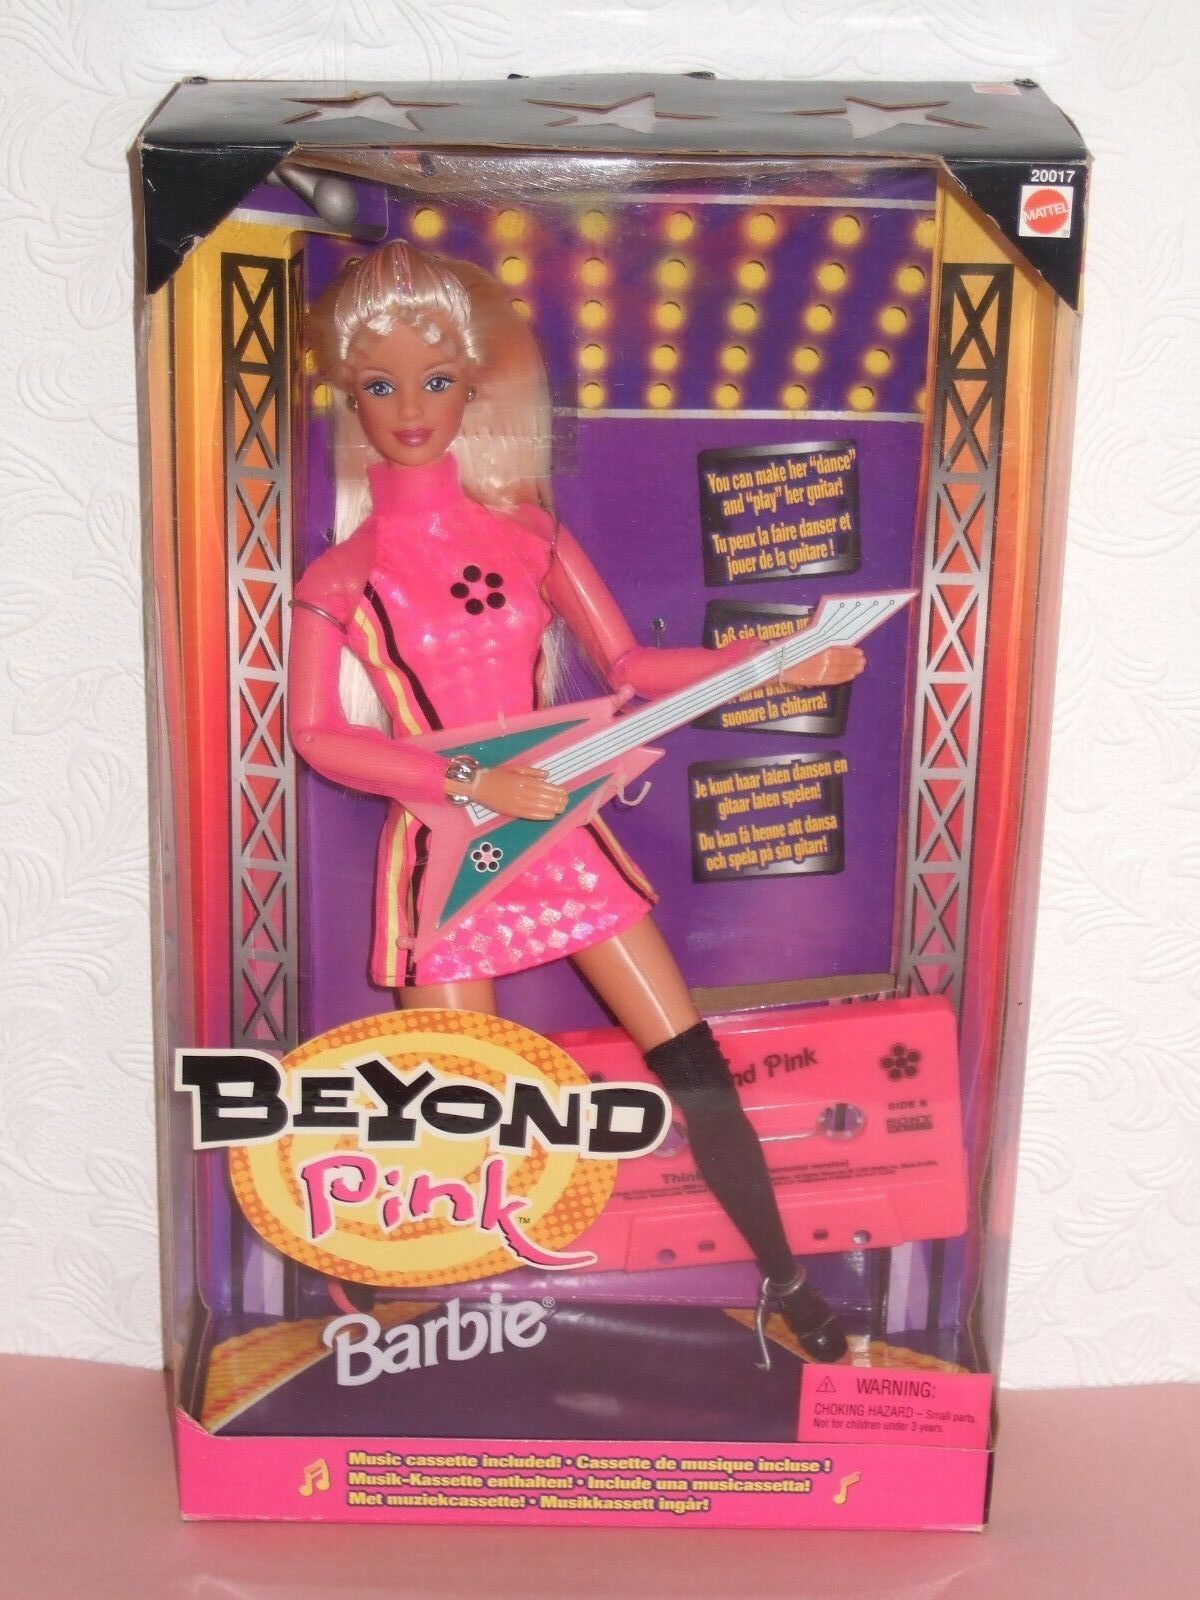 HTF VINTAGE Barbie NRFB 1998 Beyond Rosa ...Lovey doll